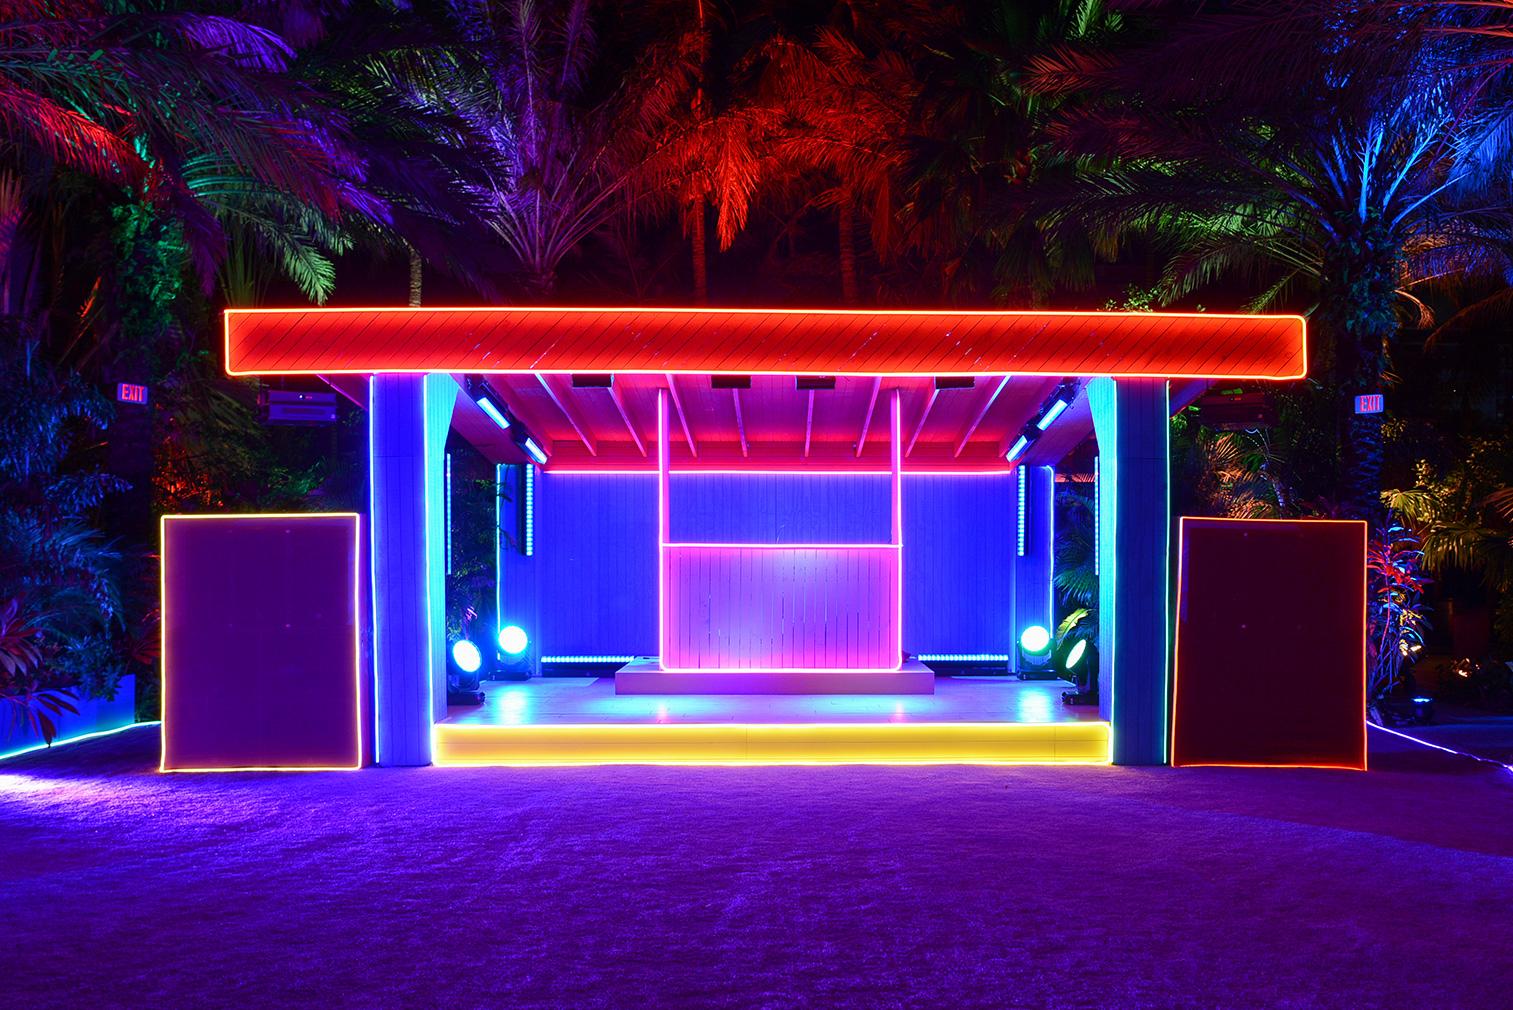 The Prada Double Club Miami by Carsten Höller. Presented by Fondazione Prada Miami, 5-7 December 2017. Photography: Casey Kelbaugh. Courtesy Fondazione Prada